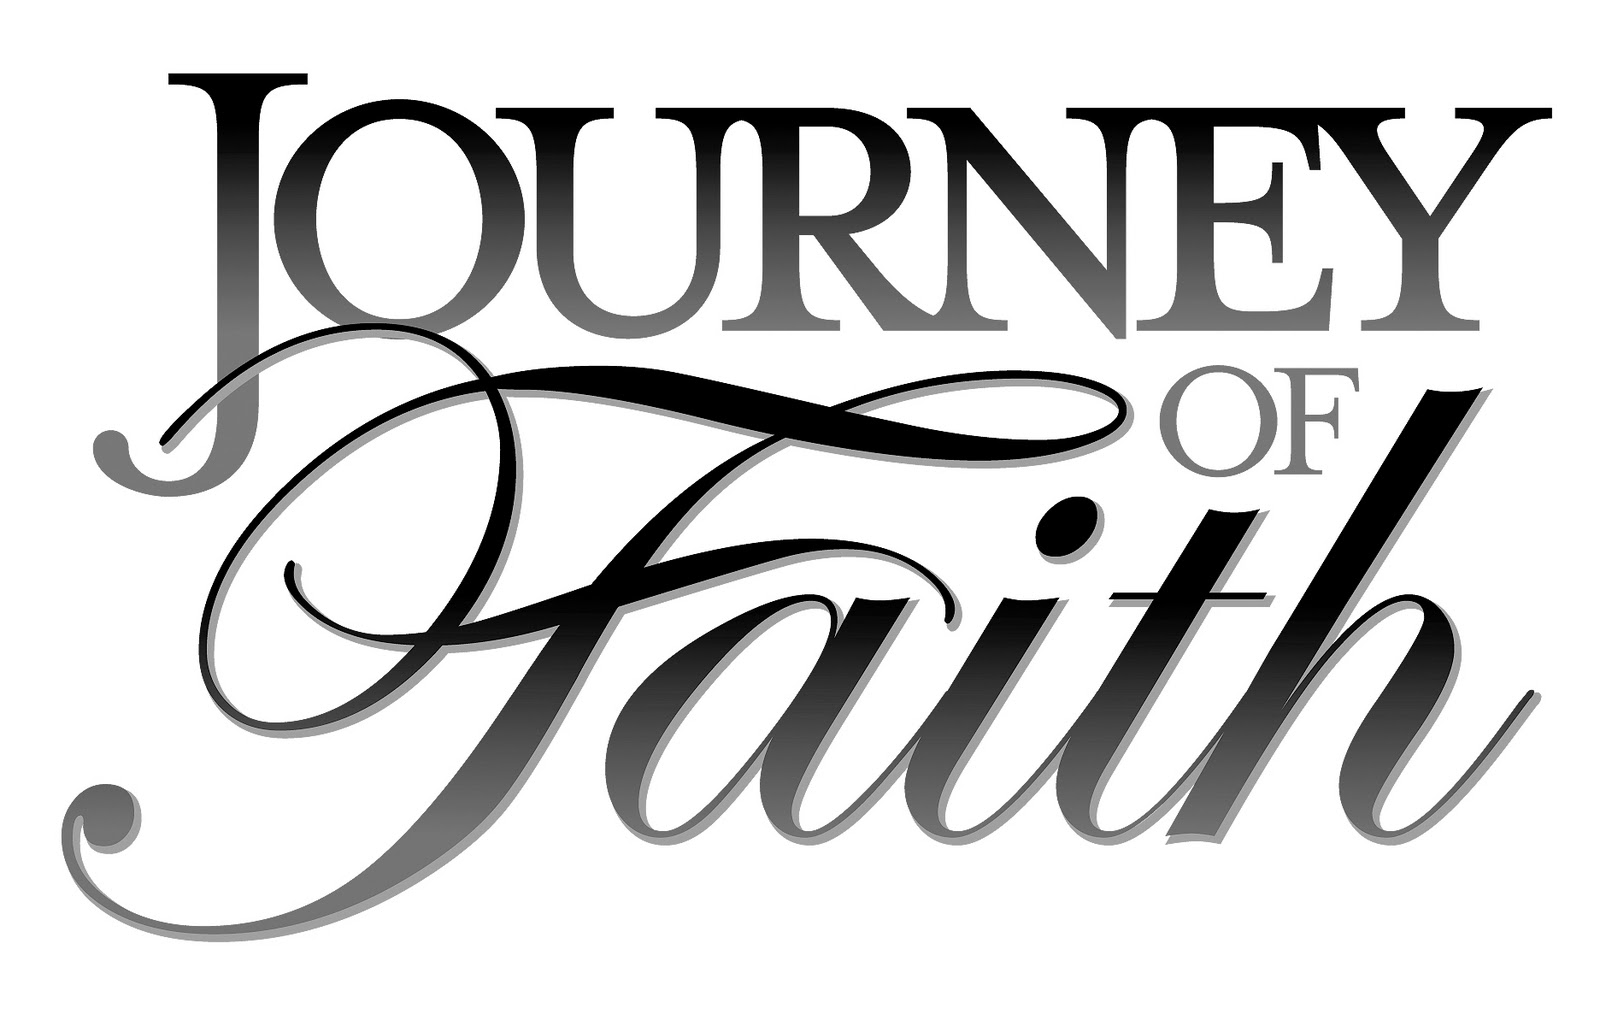 image journey of faith clip art title bw jpeg jpg the vampire rh vampirediaries wikia com Religious Spring Clip Art Catholic Religious Clip Art